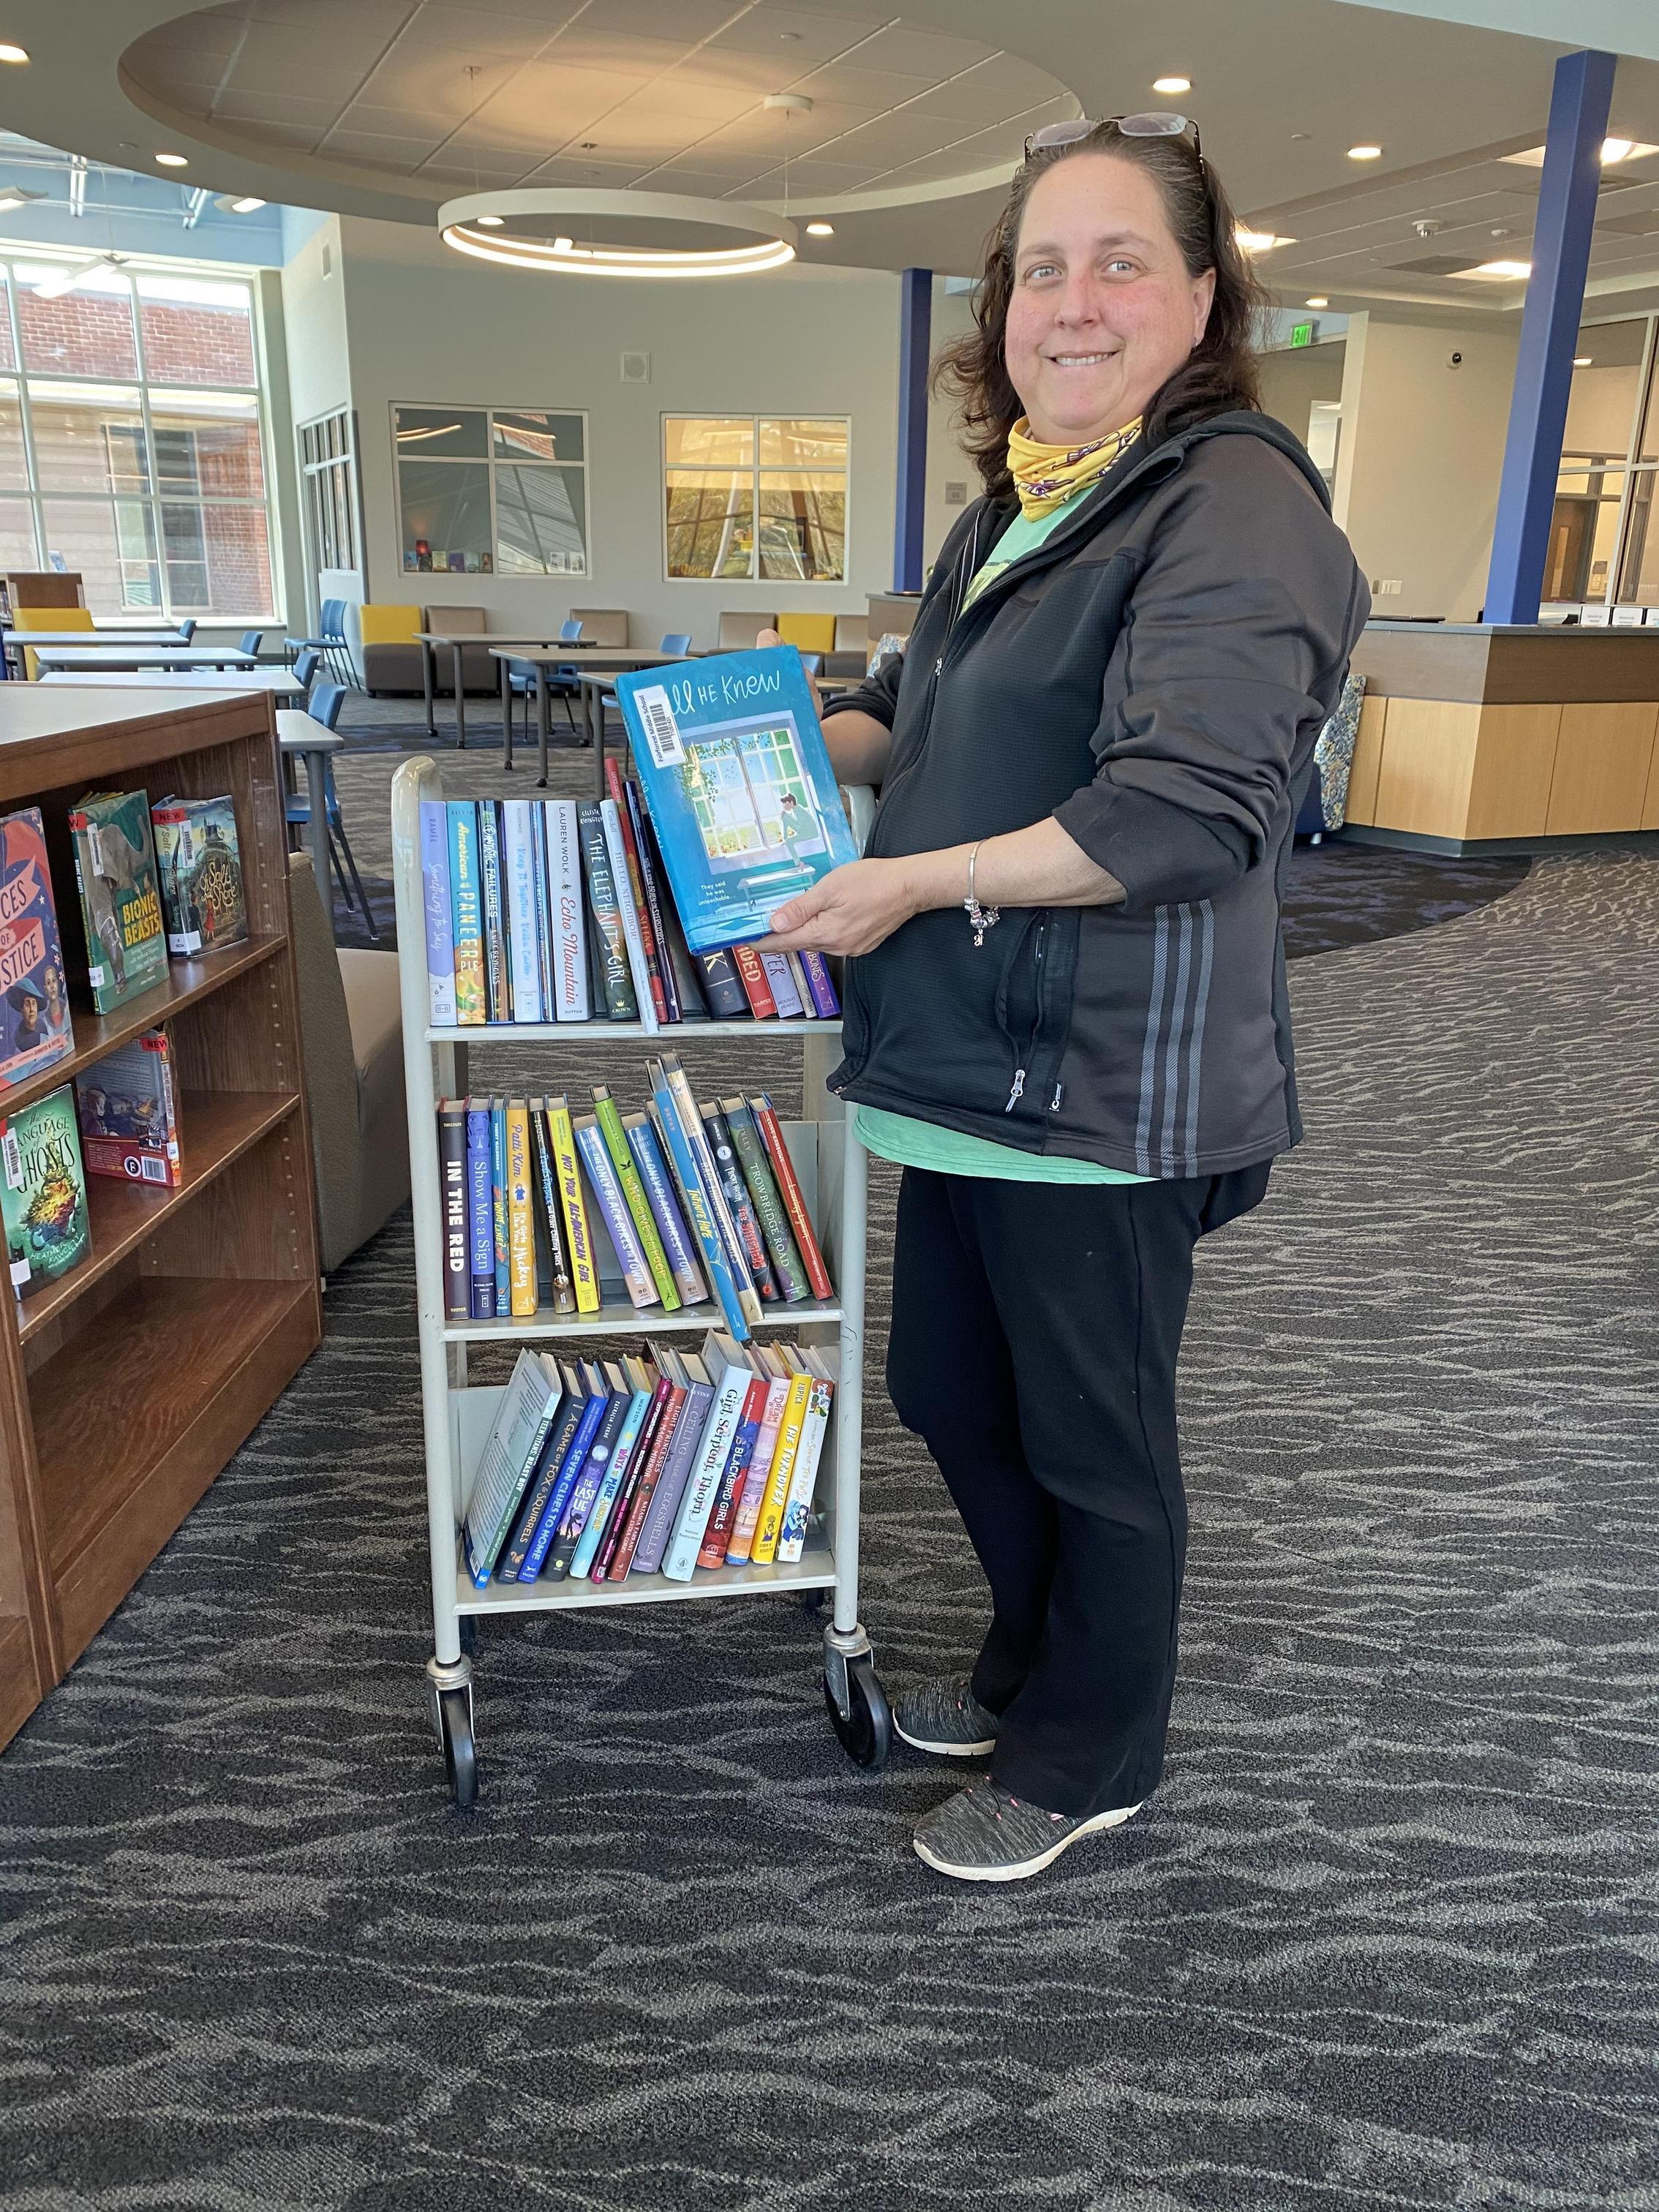 Ms. Biggerstaff shelving books